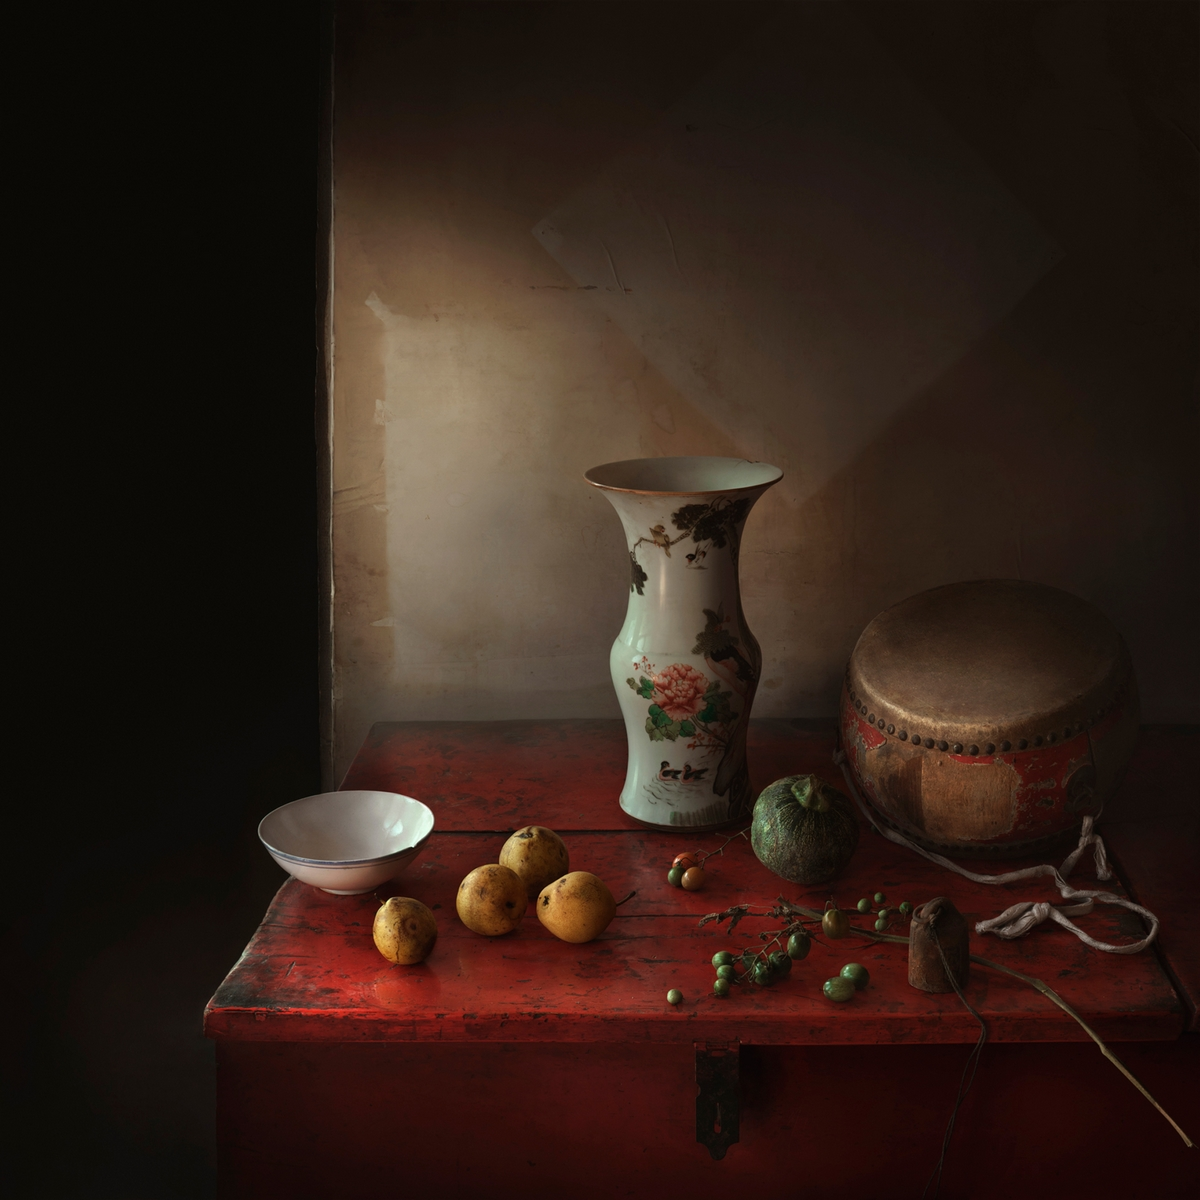 Still Life Photography by Yang Bin